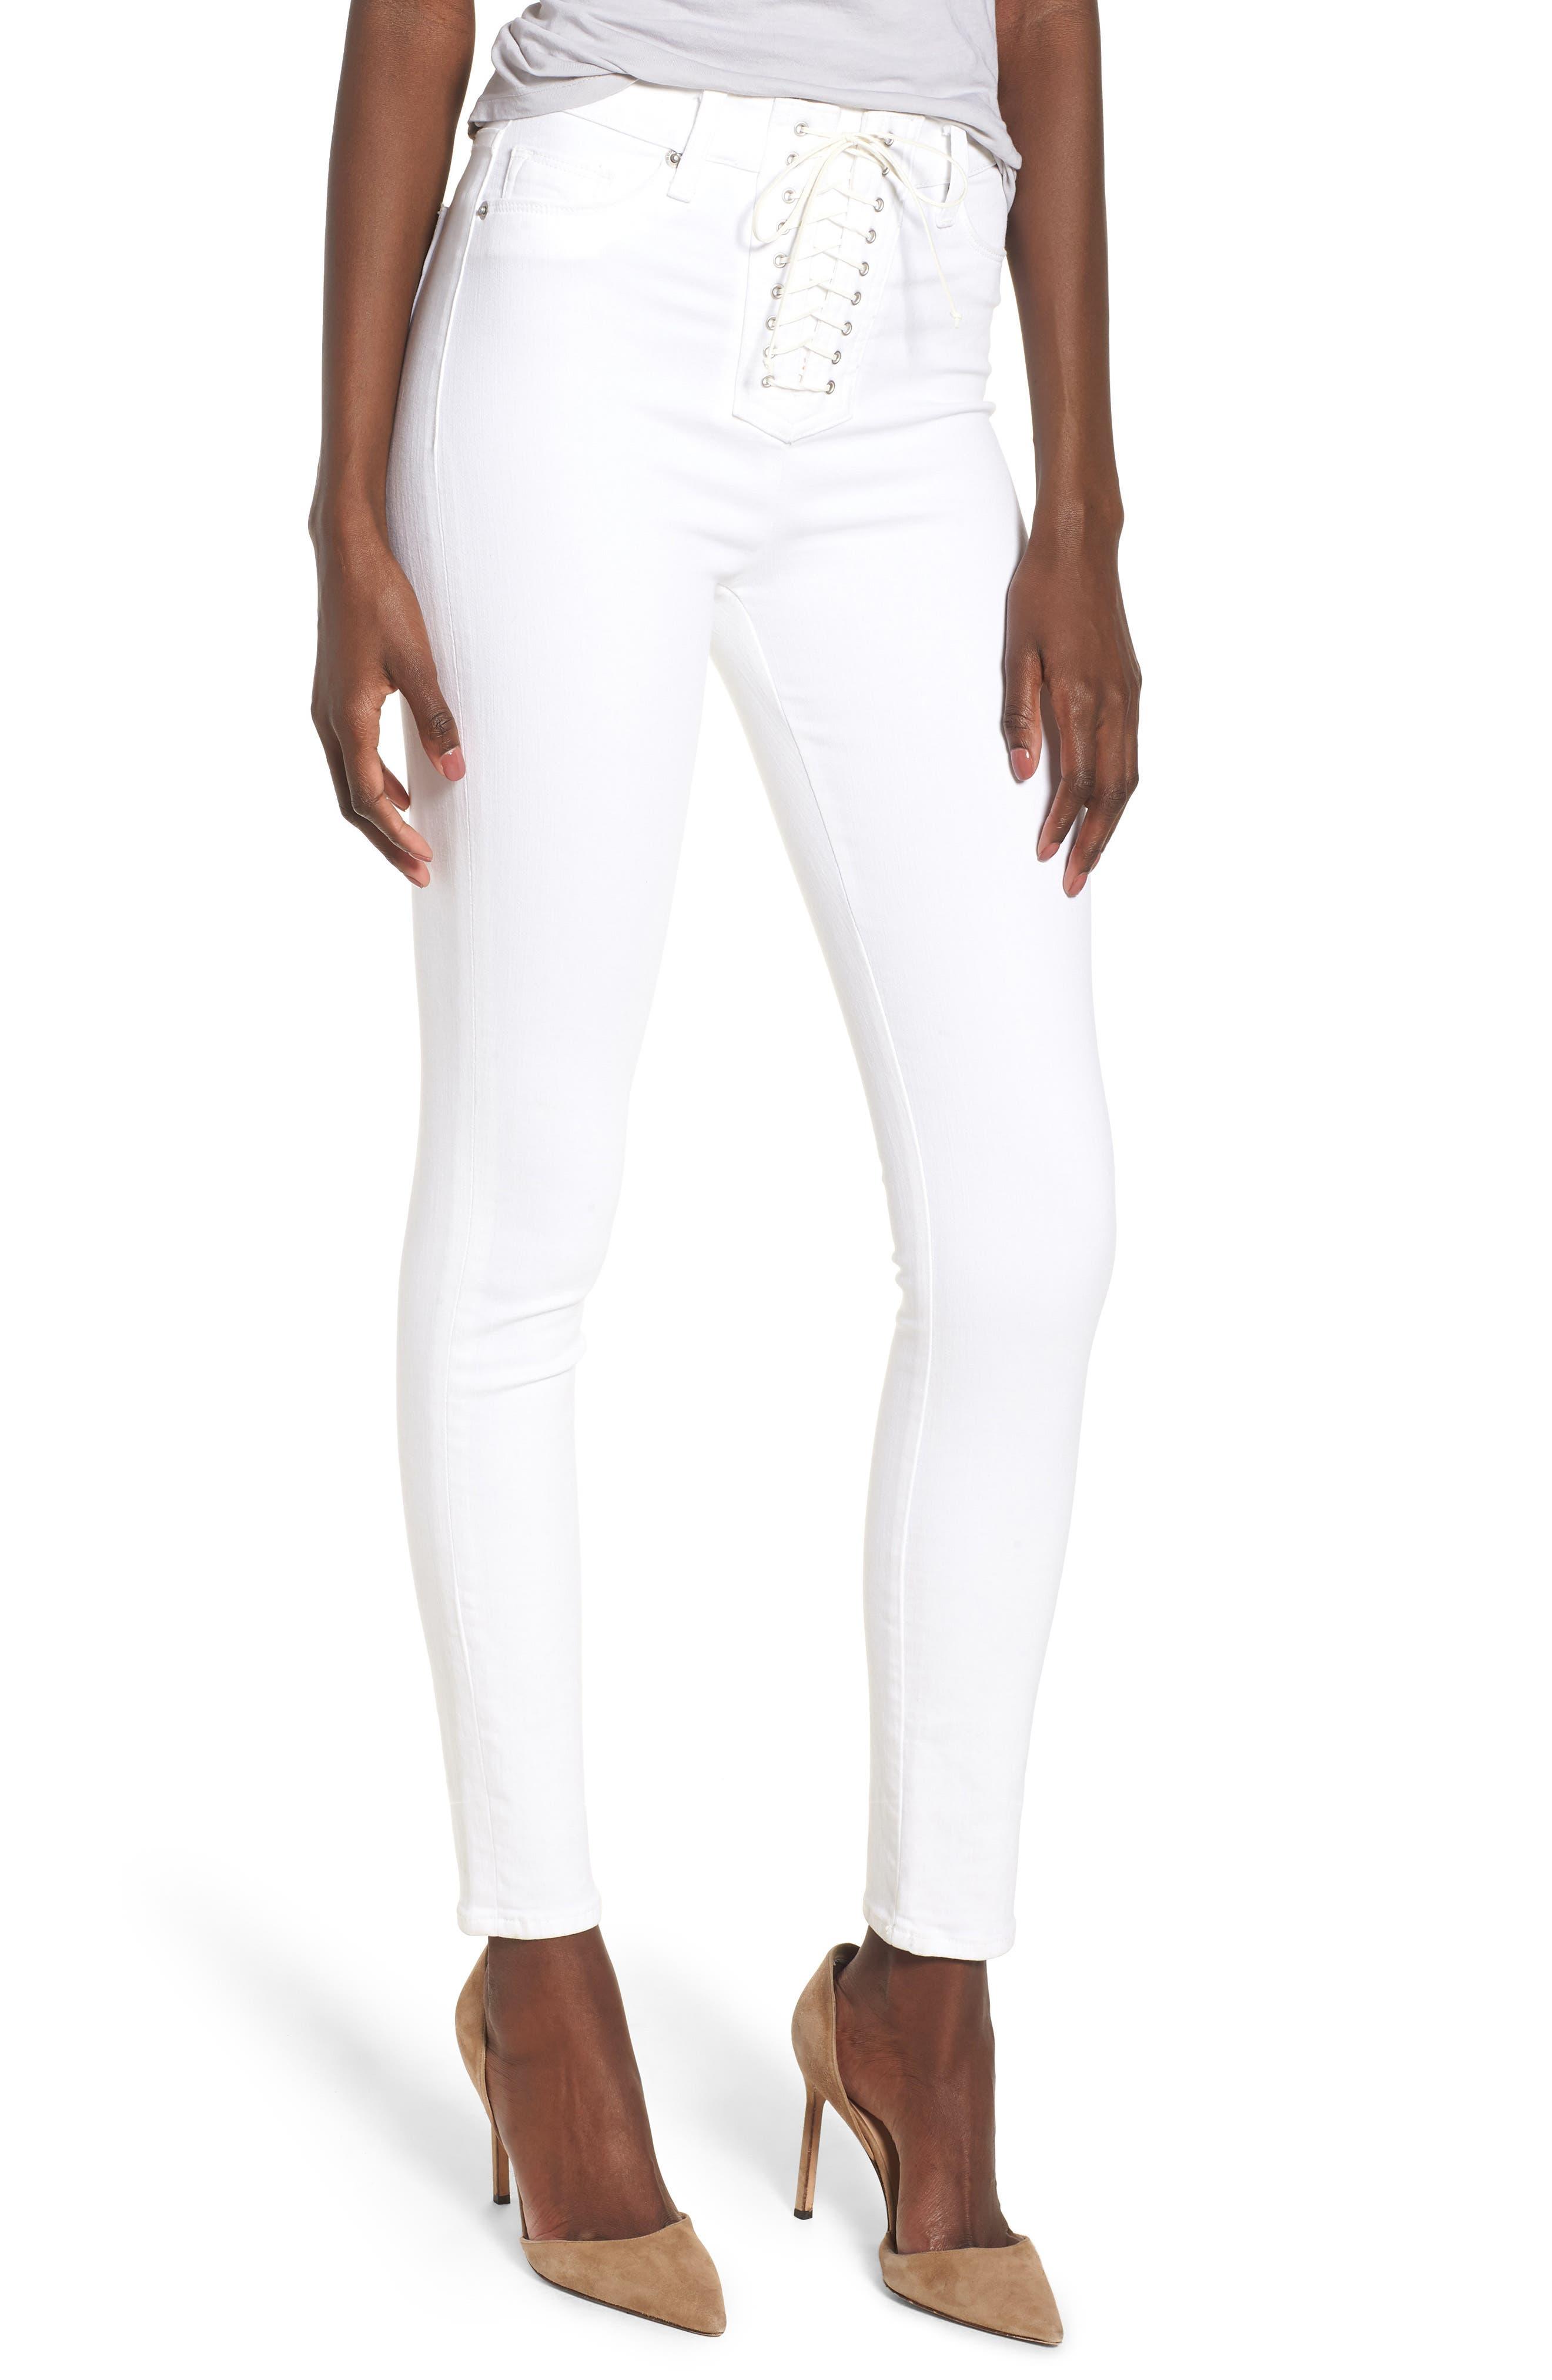 HUDSON JEANS,                             Bullocks Lace-Up High Waist Super Skinny Jeans,                             Main thumbnail 1, color,                             110